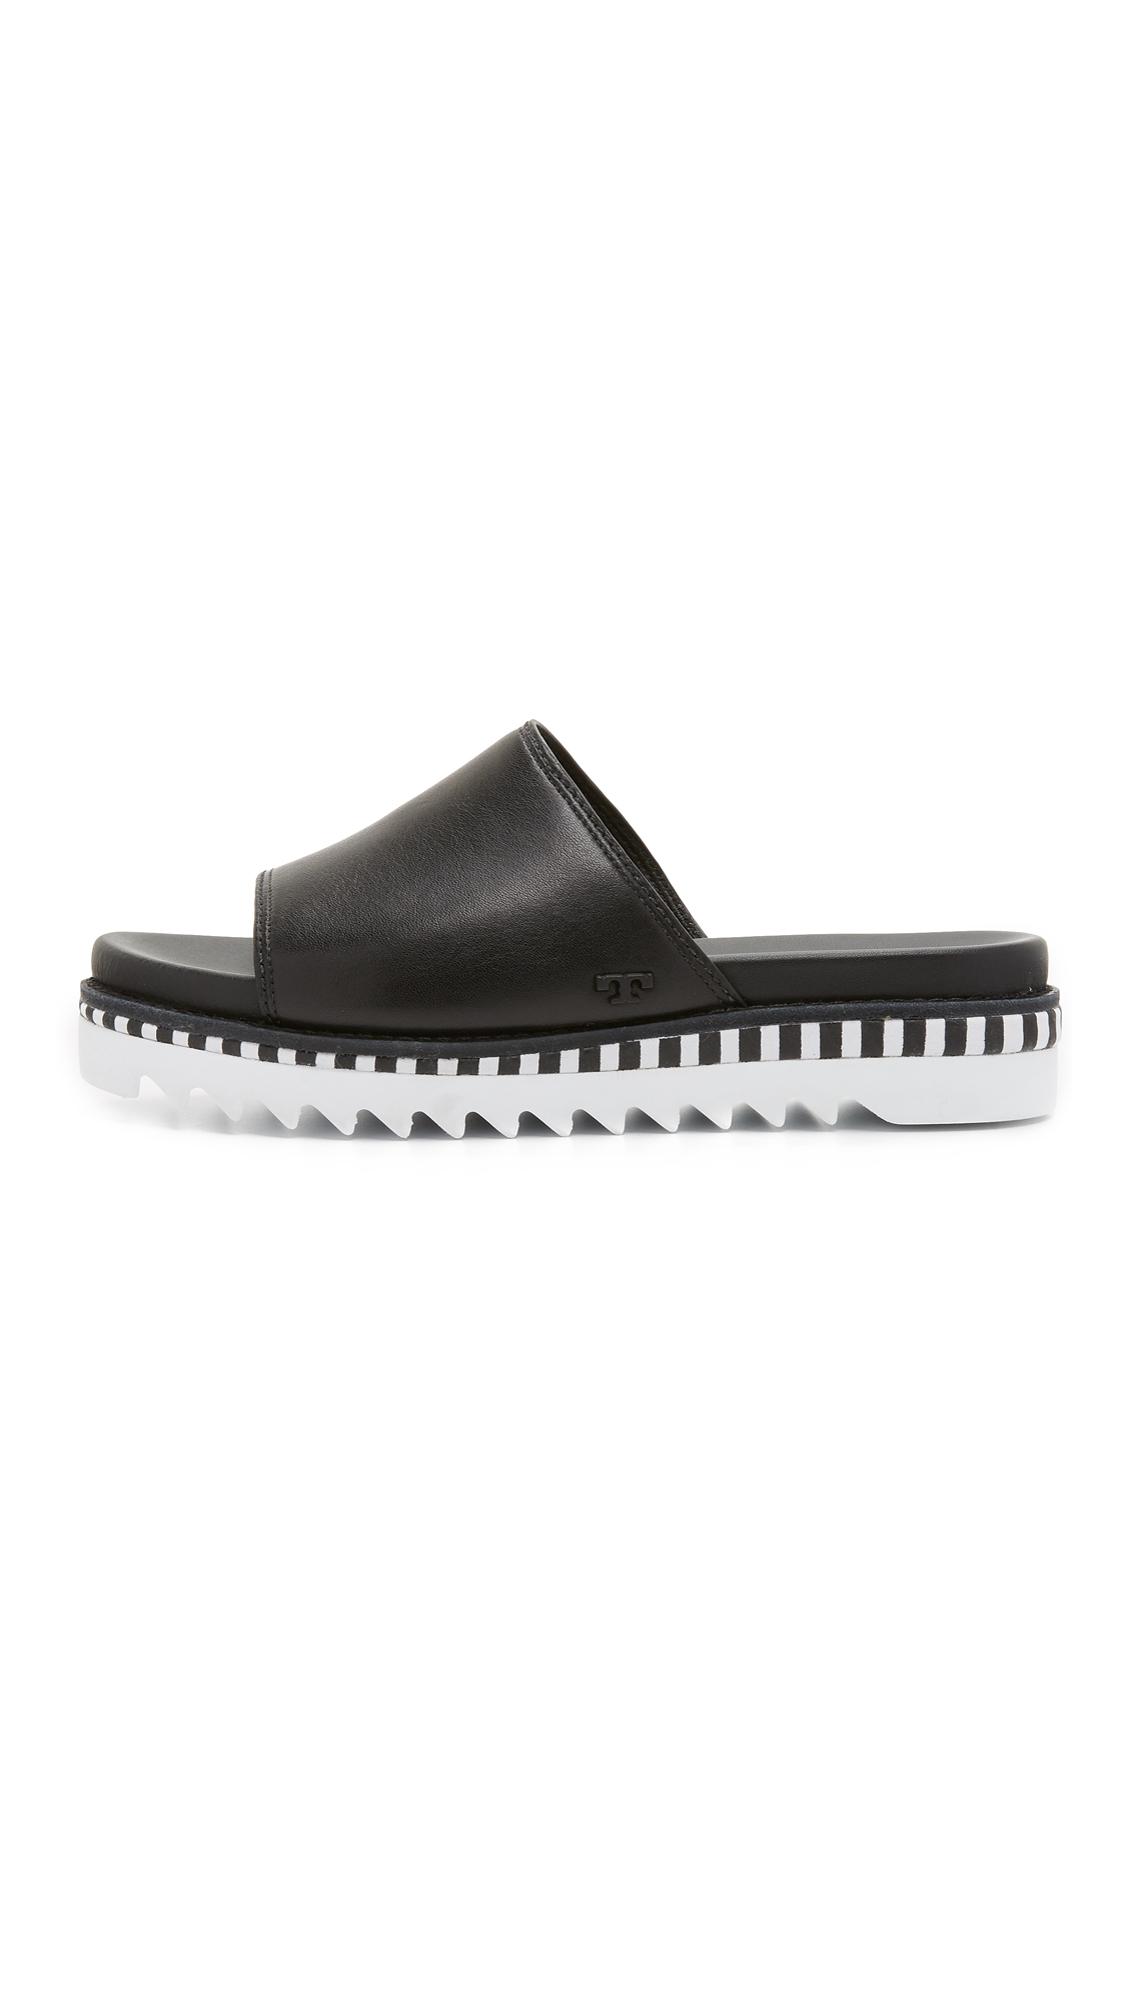 b9055b0d7b1 Lyst - Tory Burch Sawtooth Slide Sandals in Black